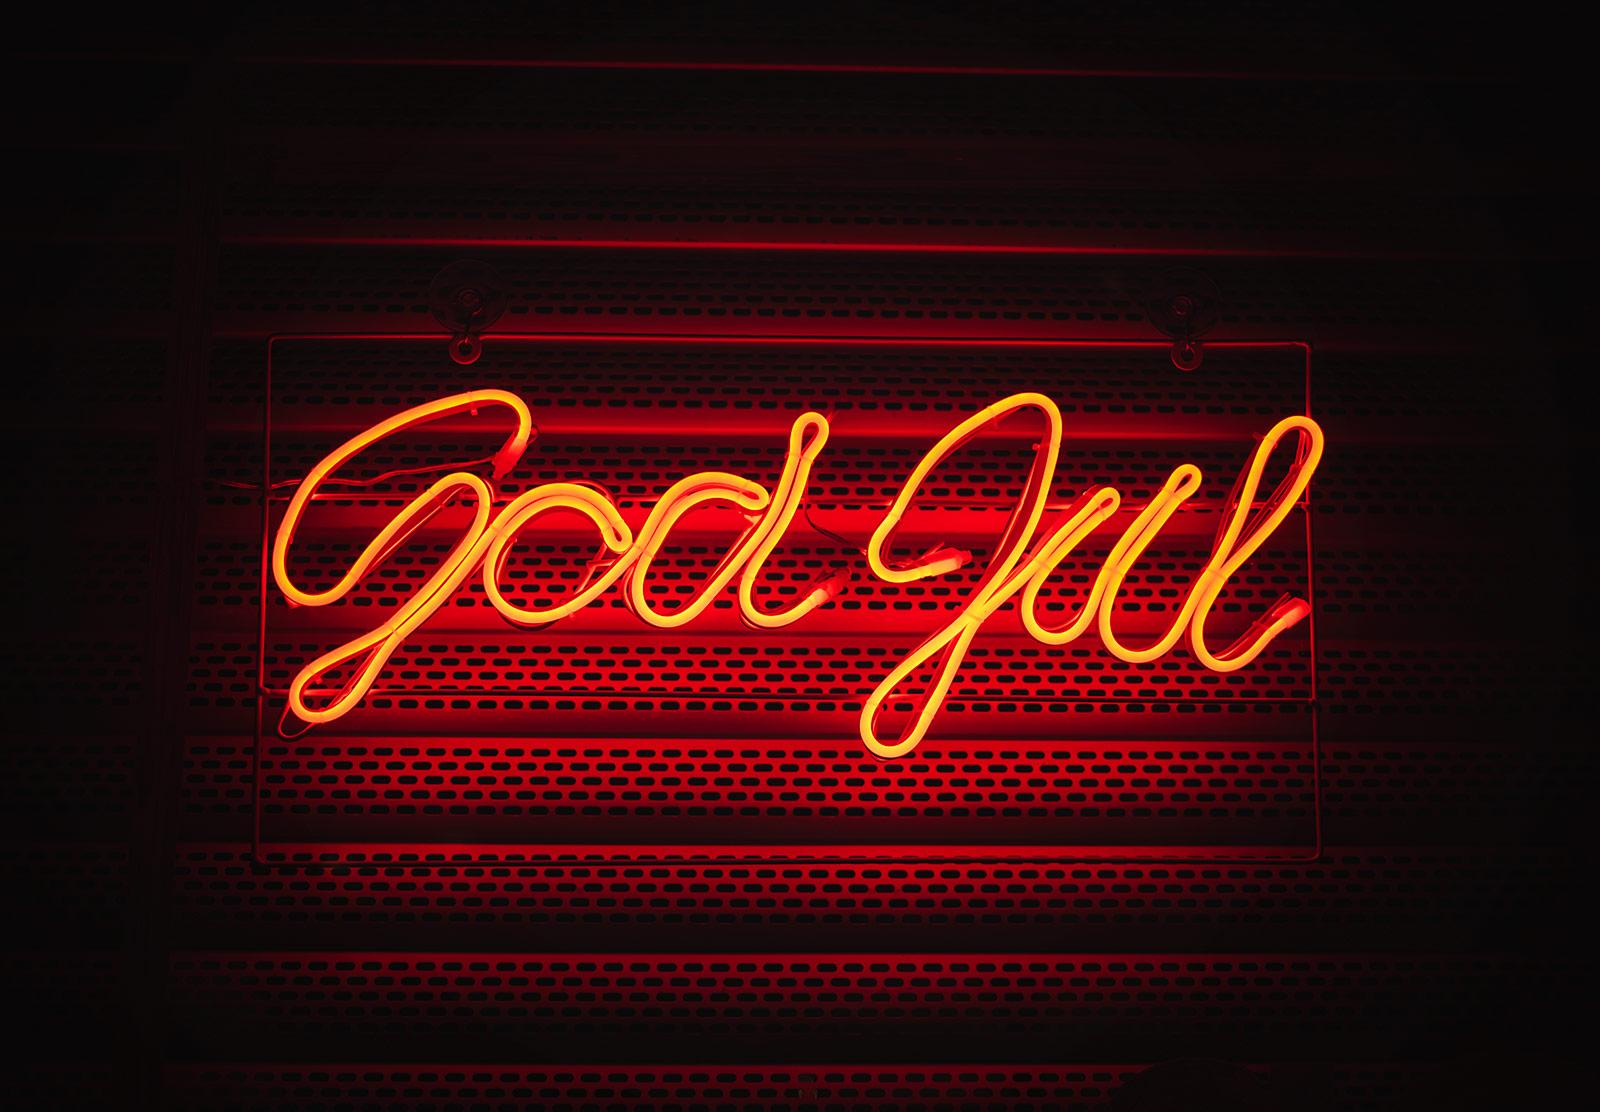 God Jul neon sign